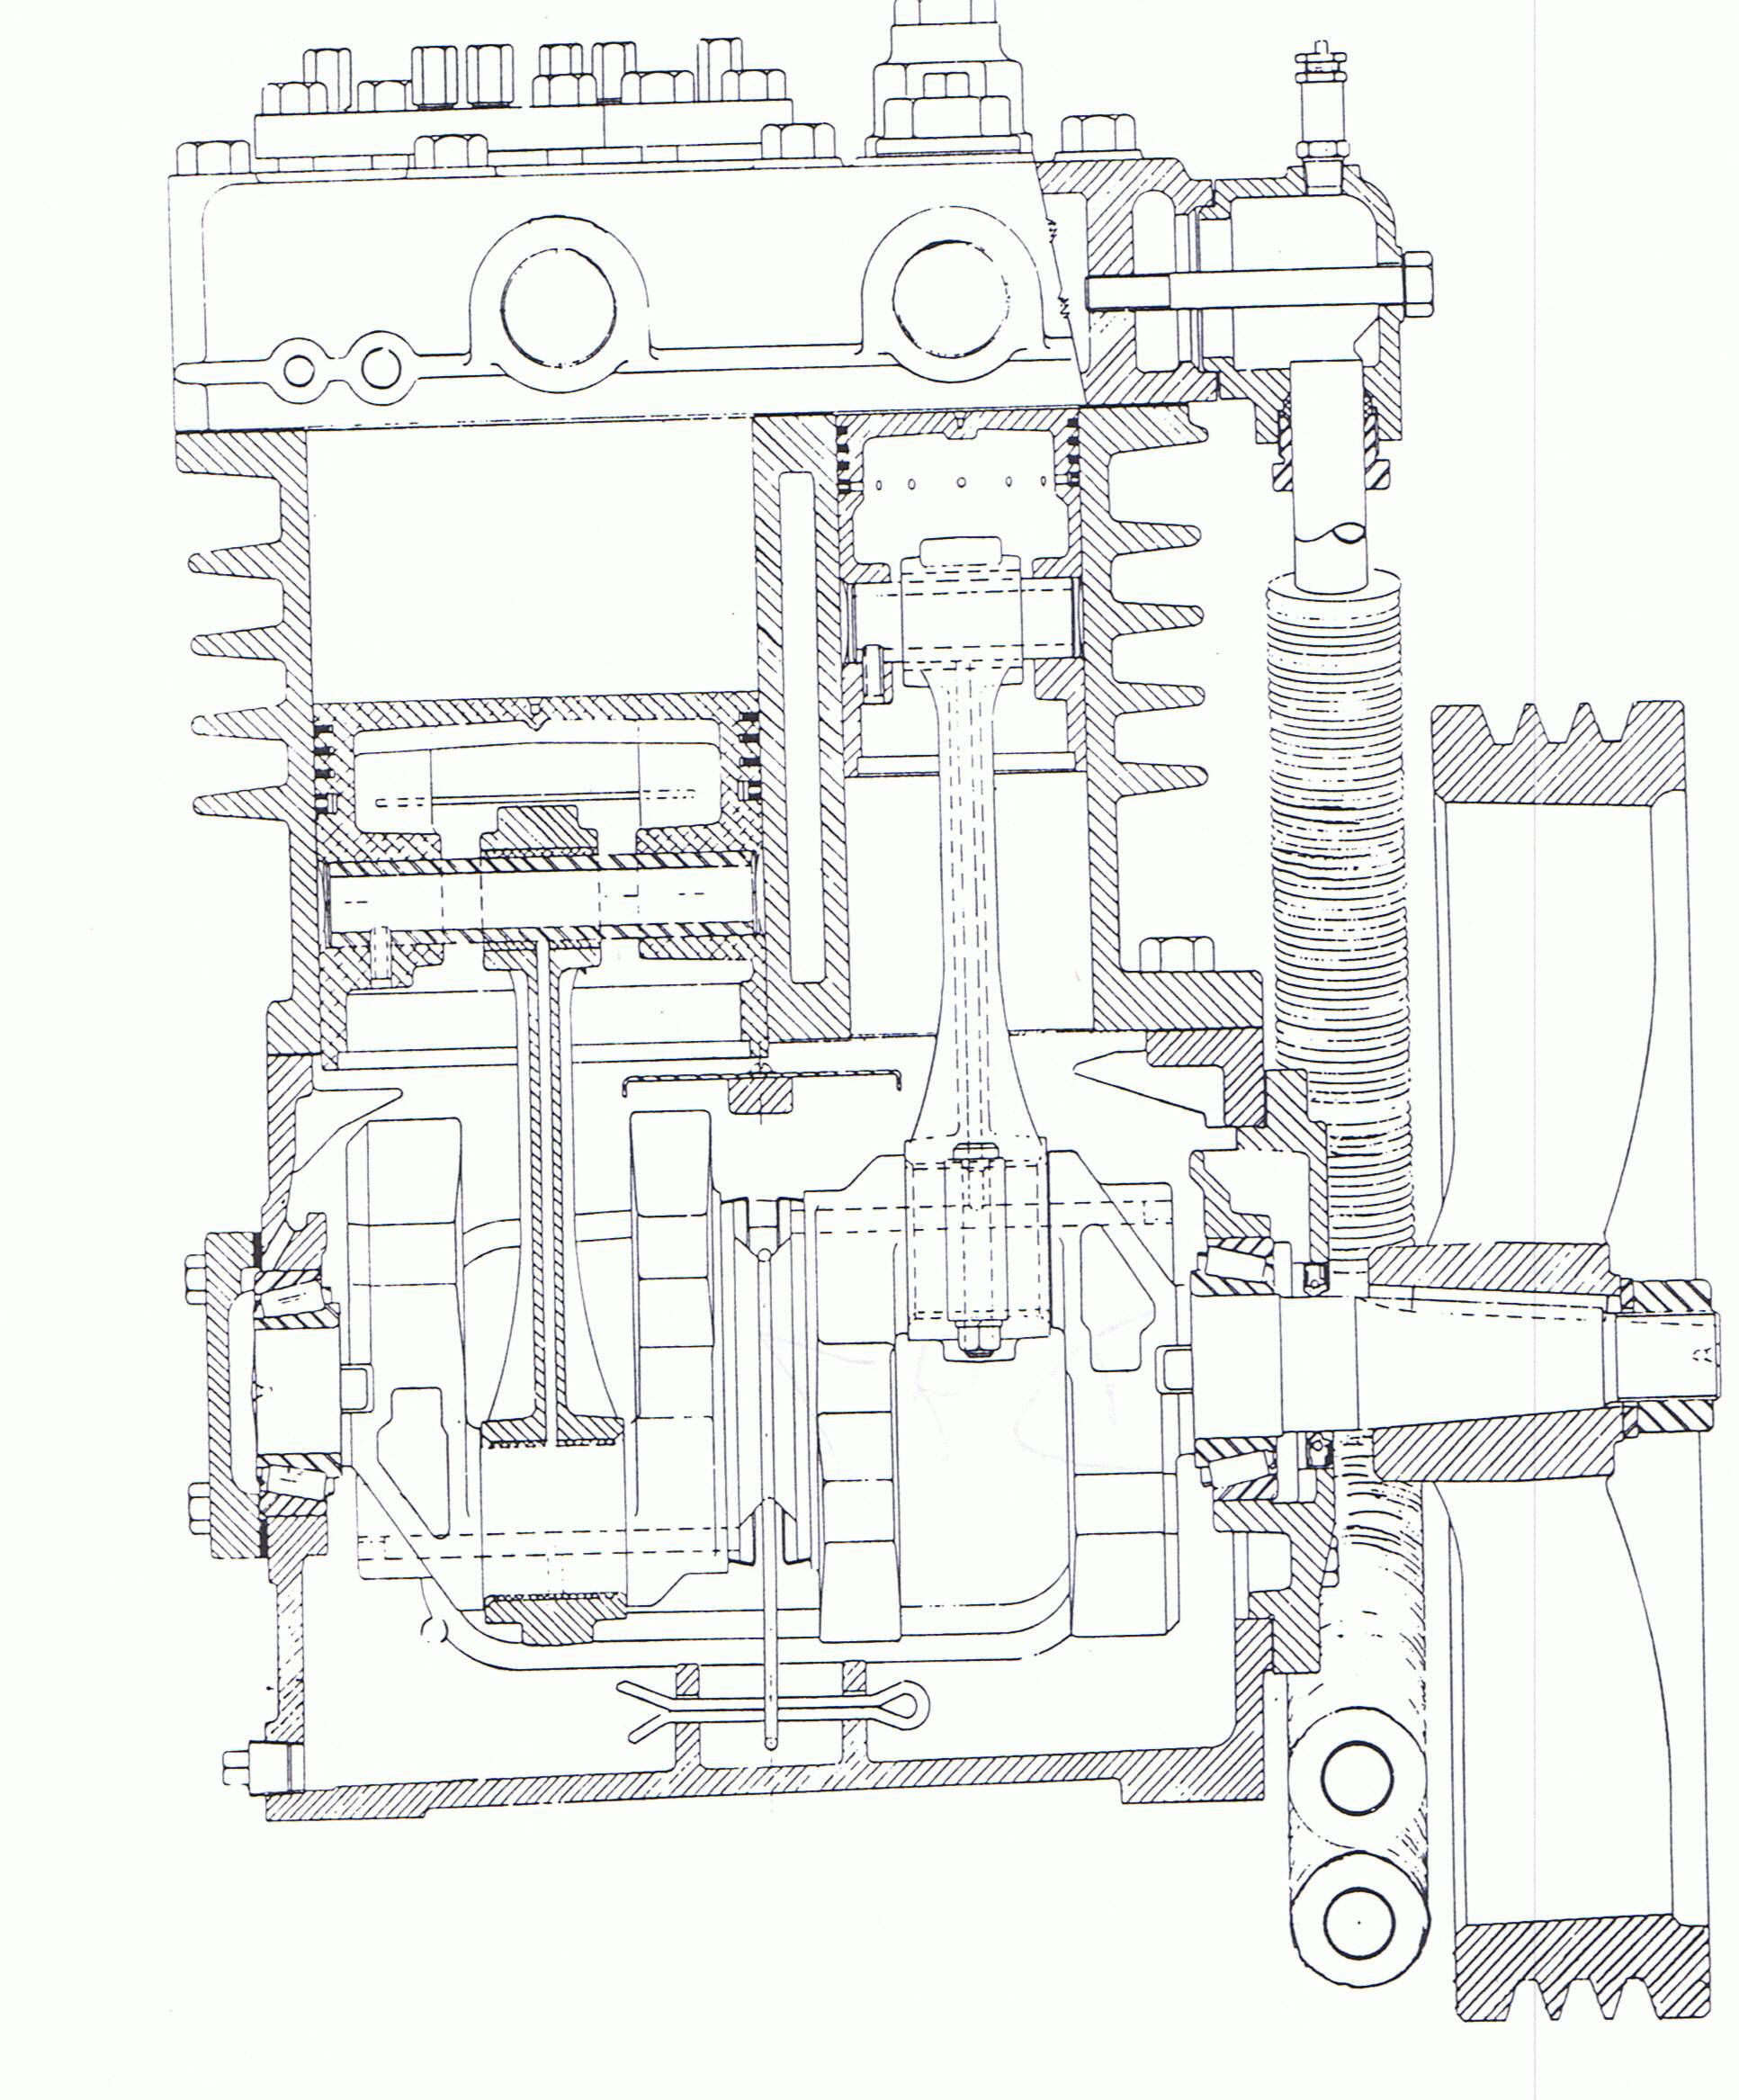 worthington compressor parts manuals rh pandarestaurant us worthington air compressor parts worthington air compressor manual for 02285